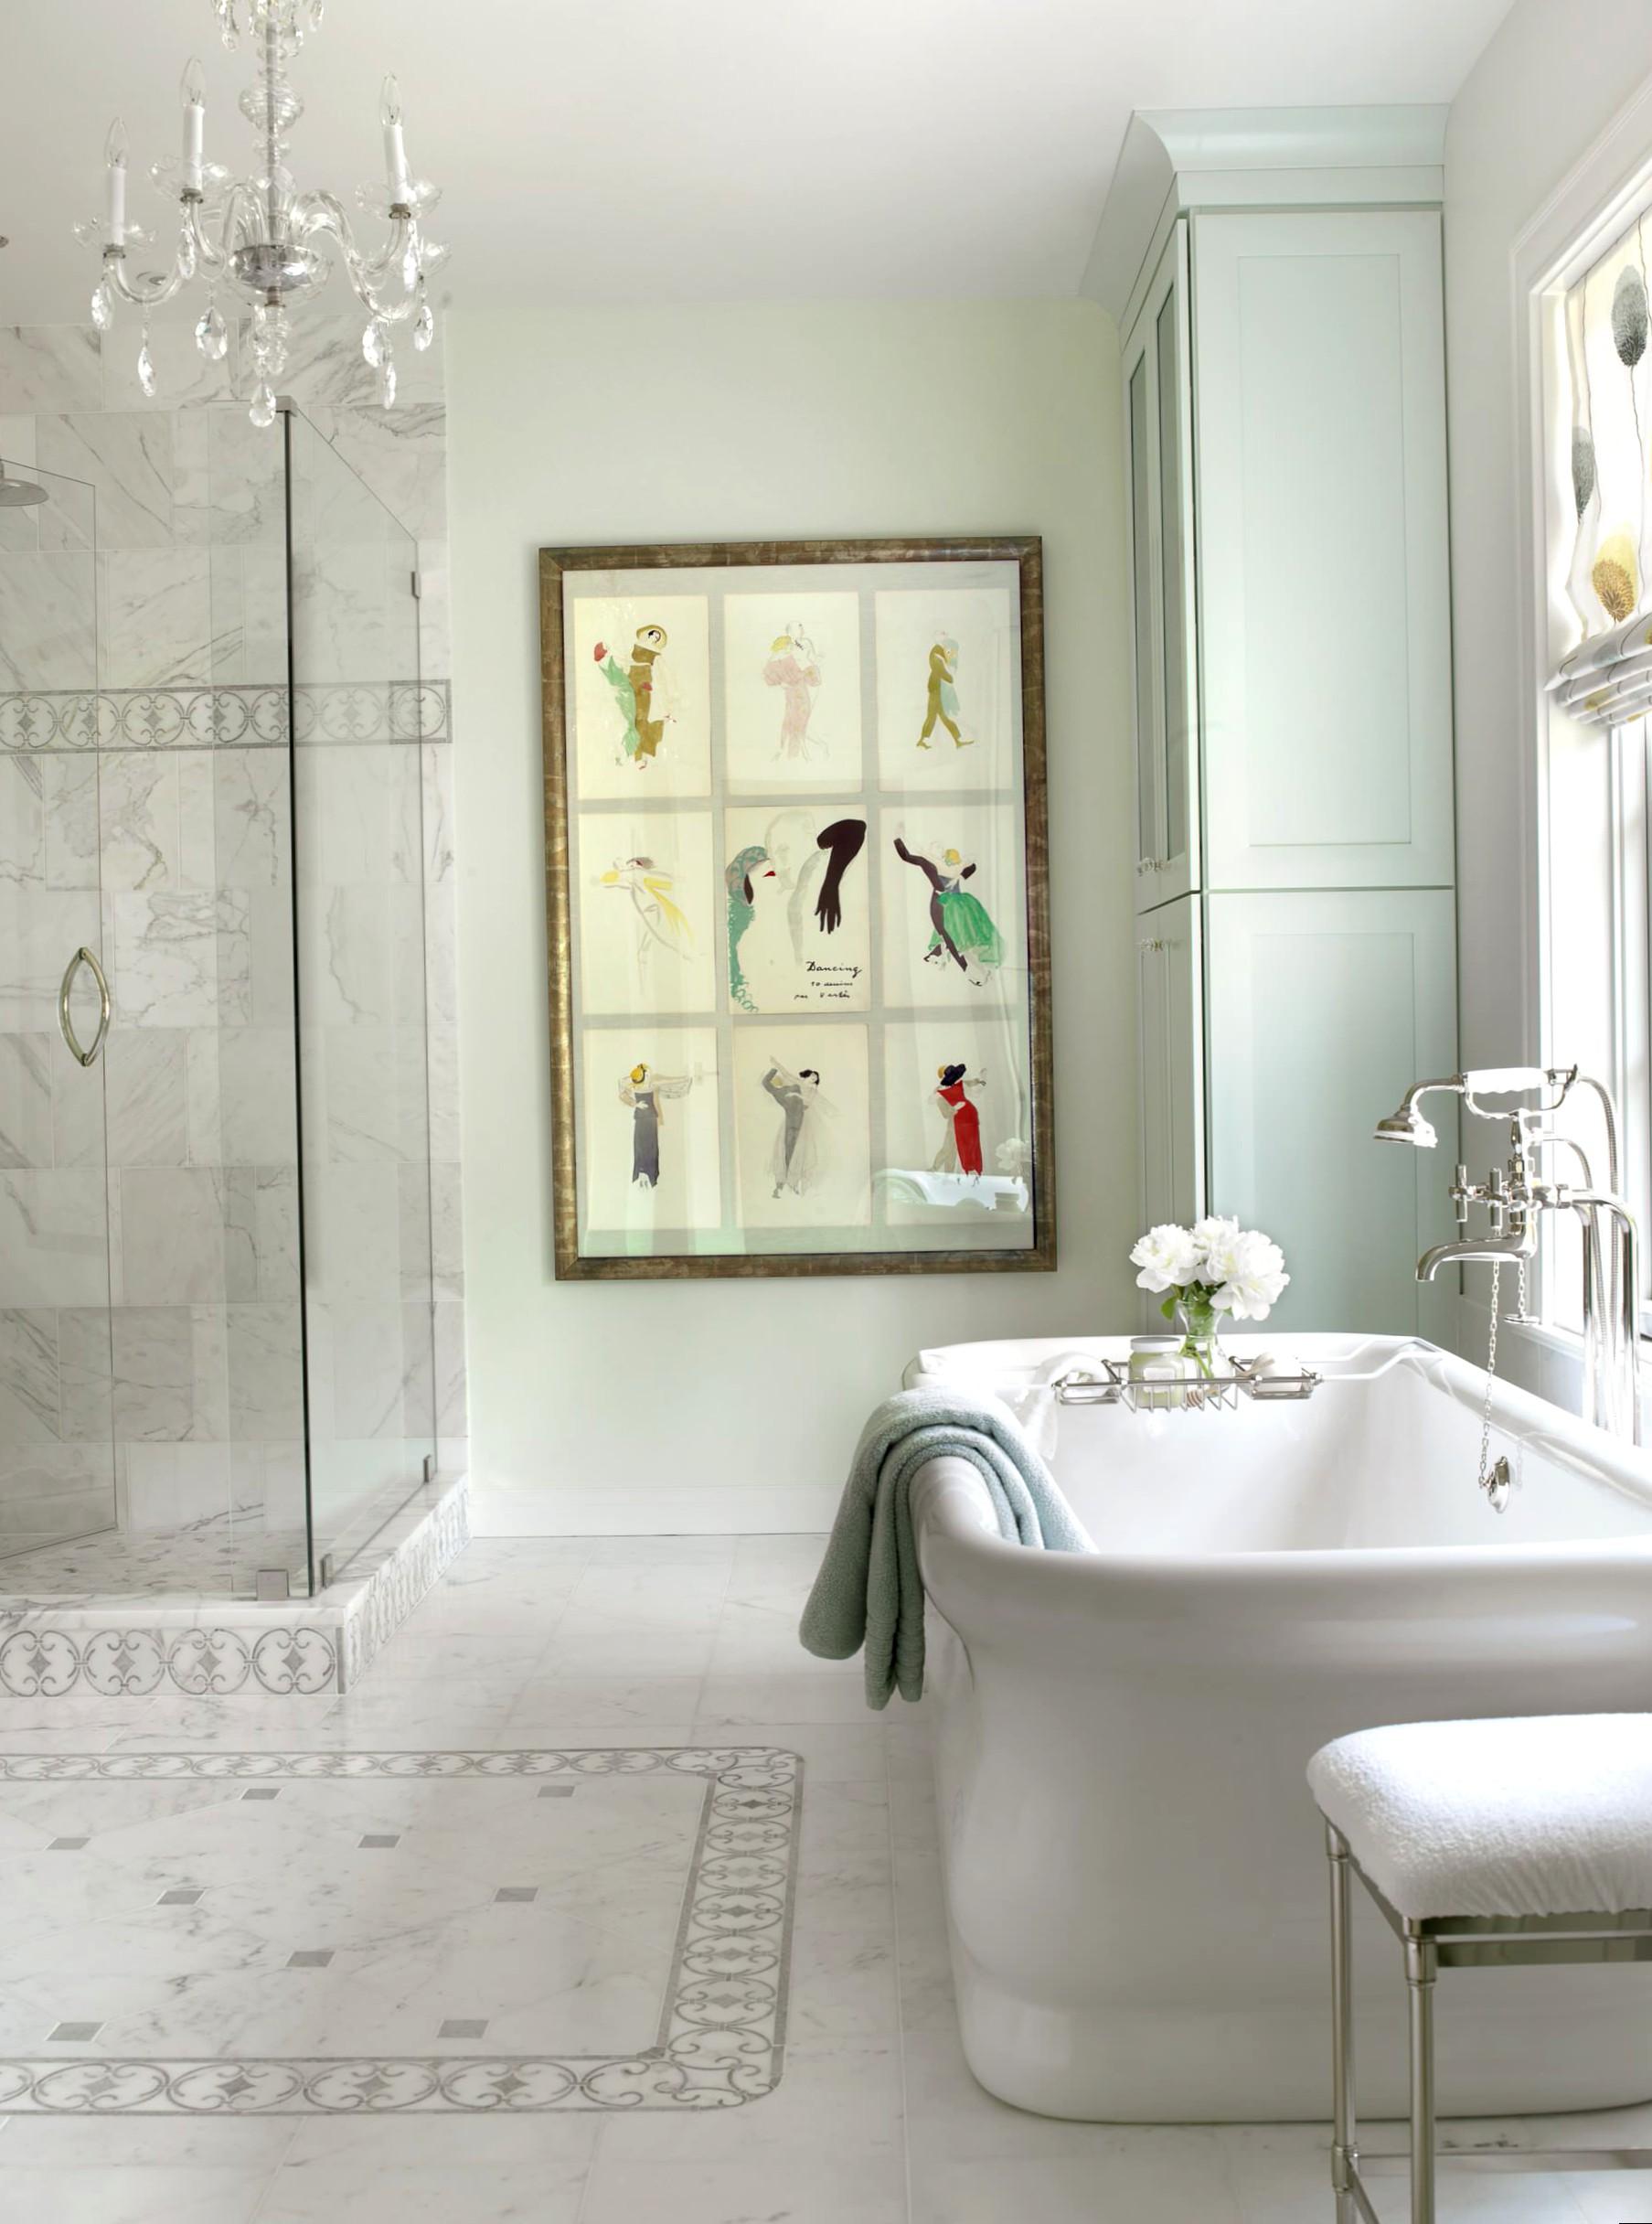 French Bathroom Ideas, bathroom ideas, bathroom decoration, maison valentina, bathroom decor, interior design french bathroom ideas French it Up! – Check the Best French Bathroom Ideas french bathroom 6